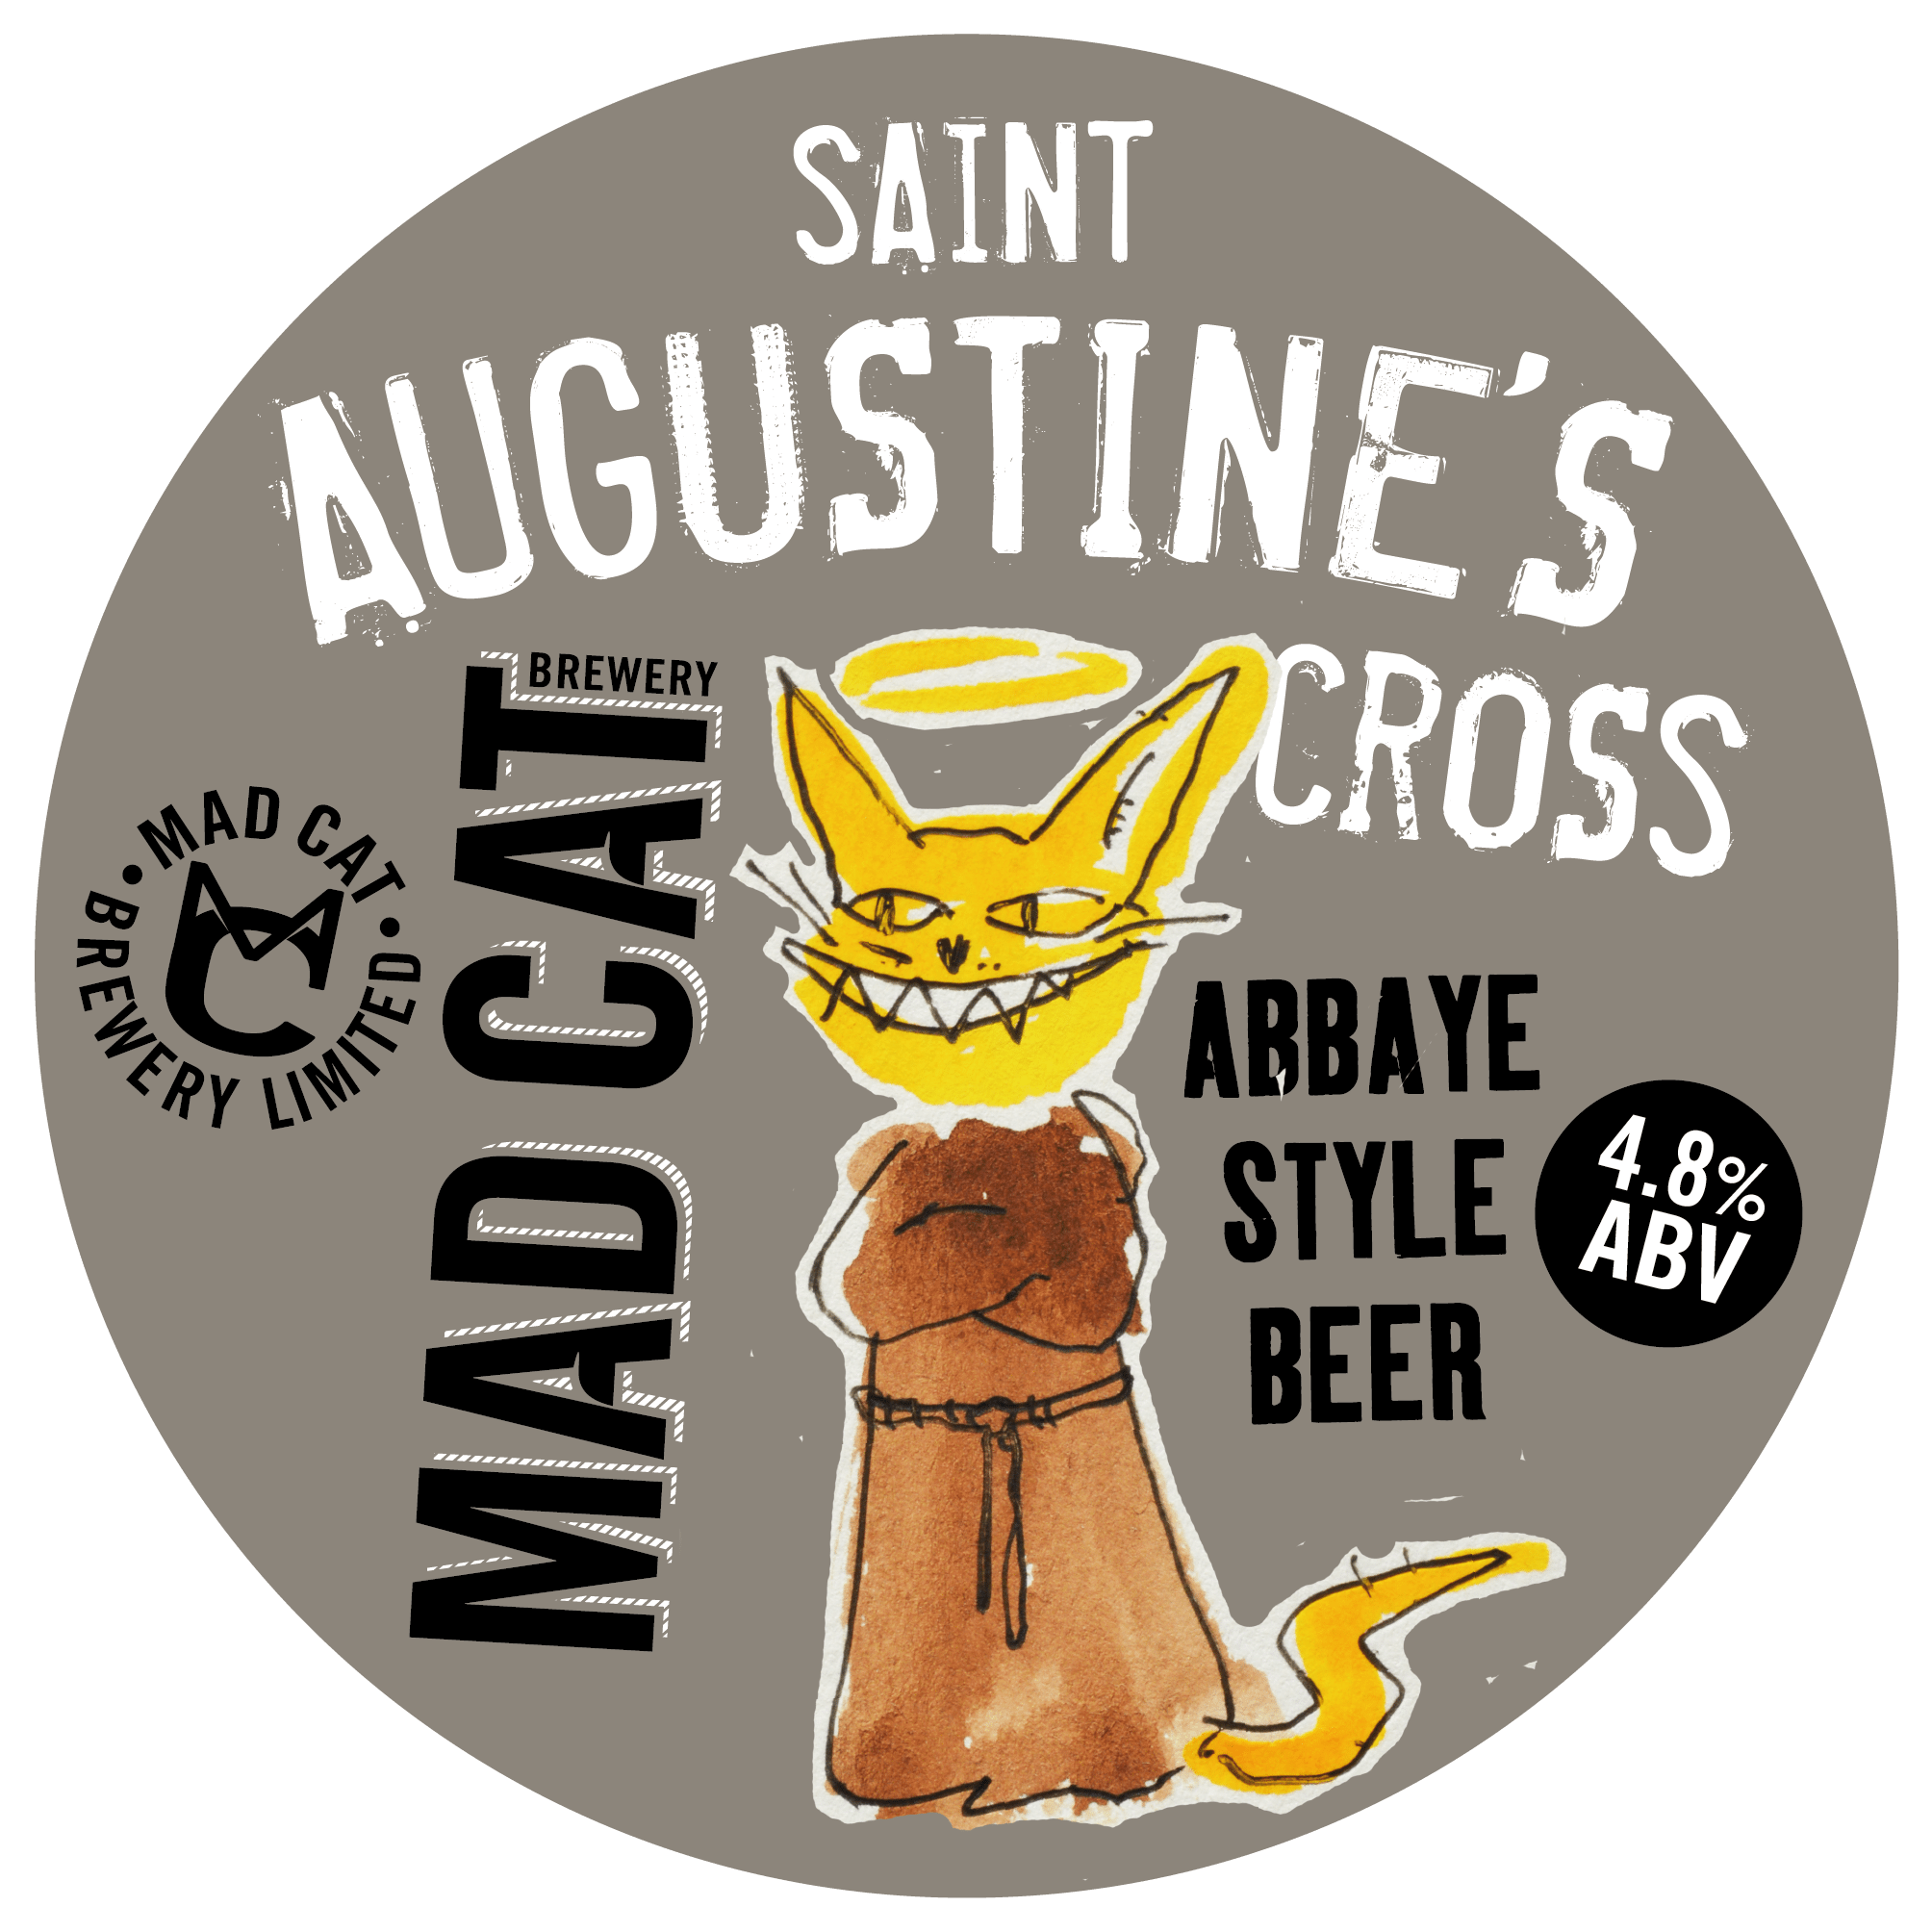 St Augustine's Cross